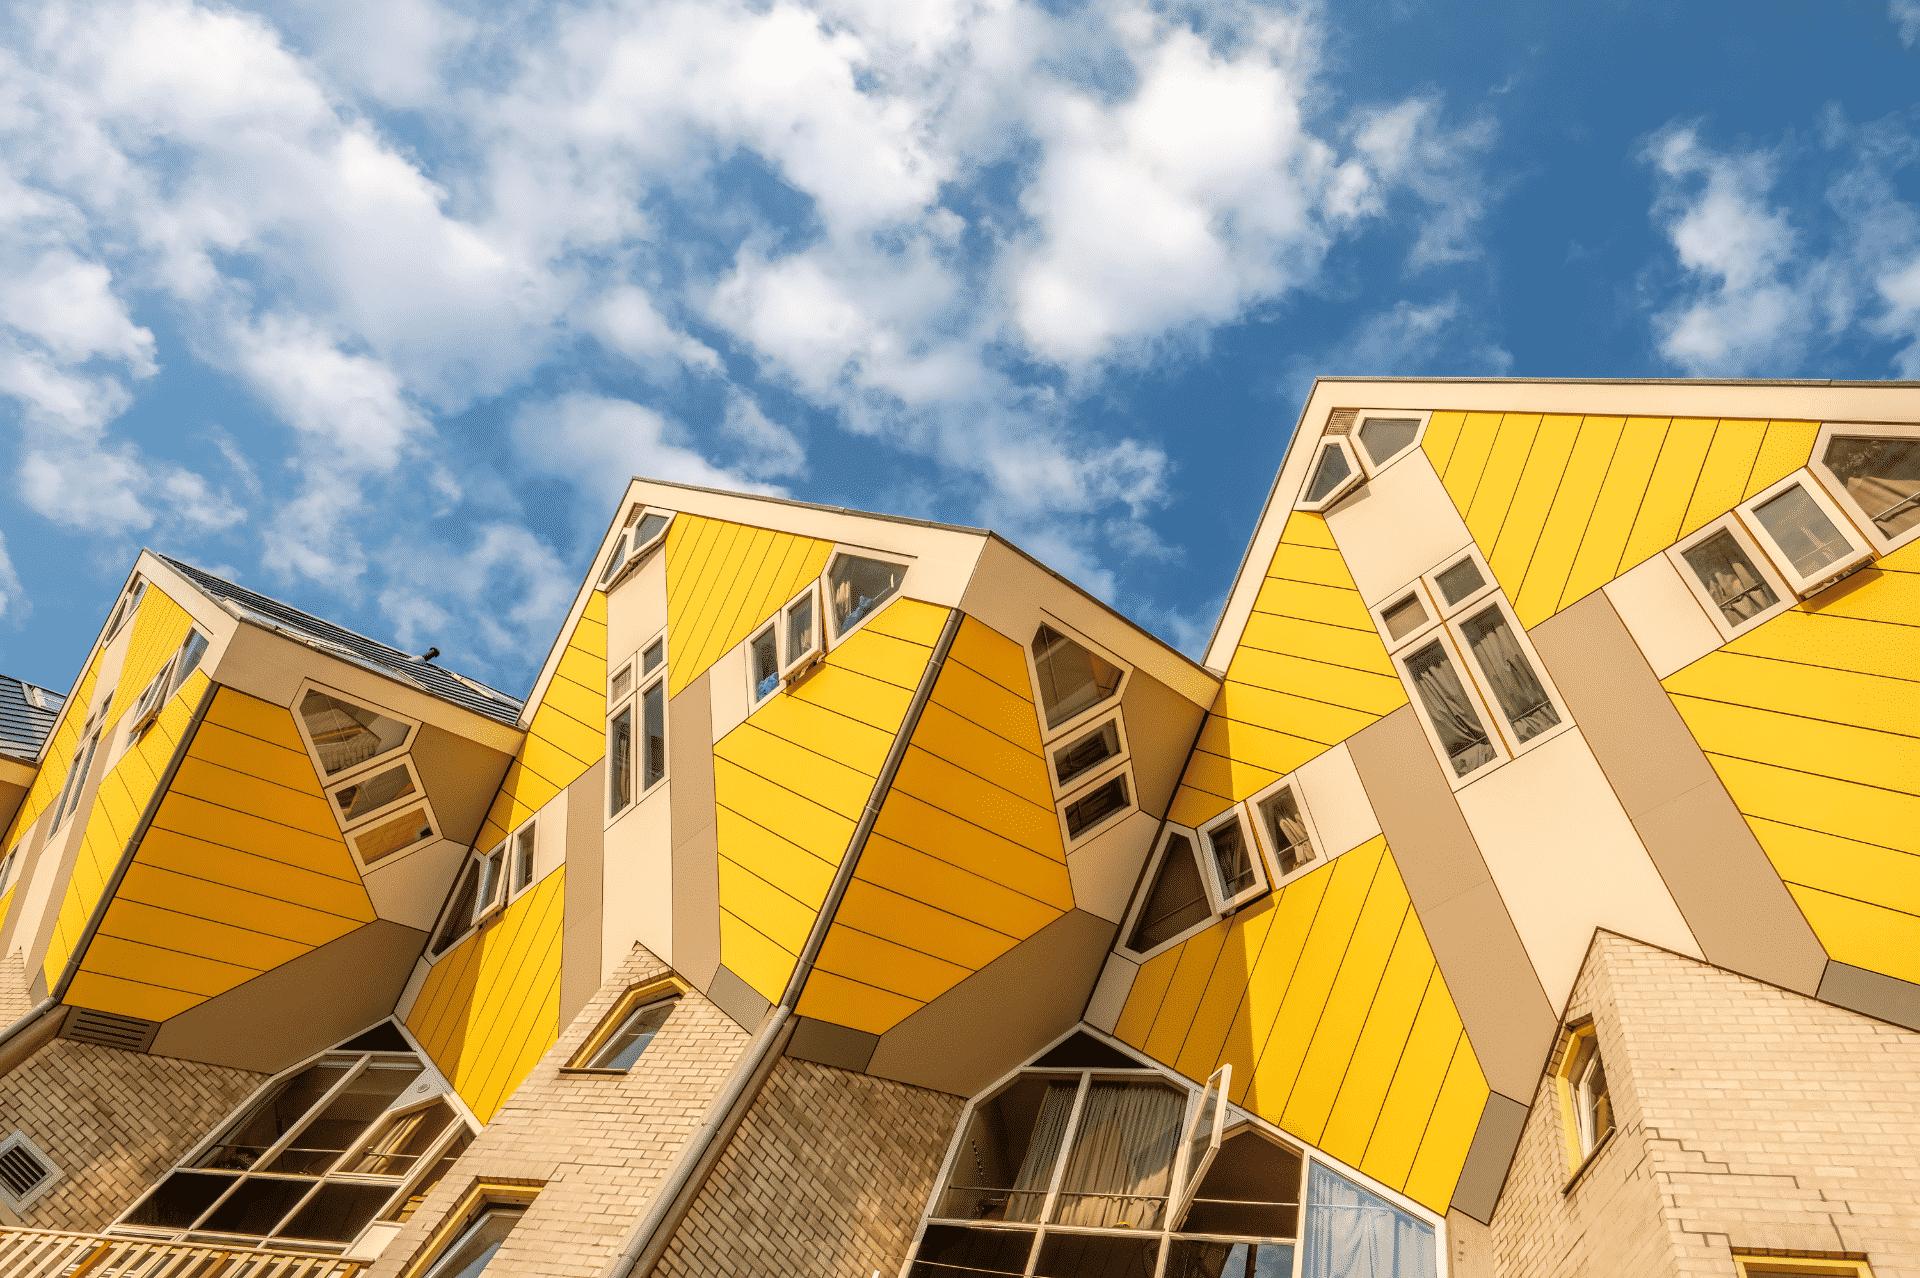 Rotterdam De Kubus huizen